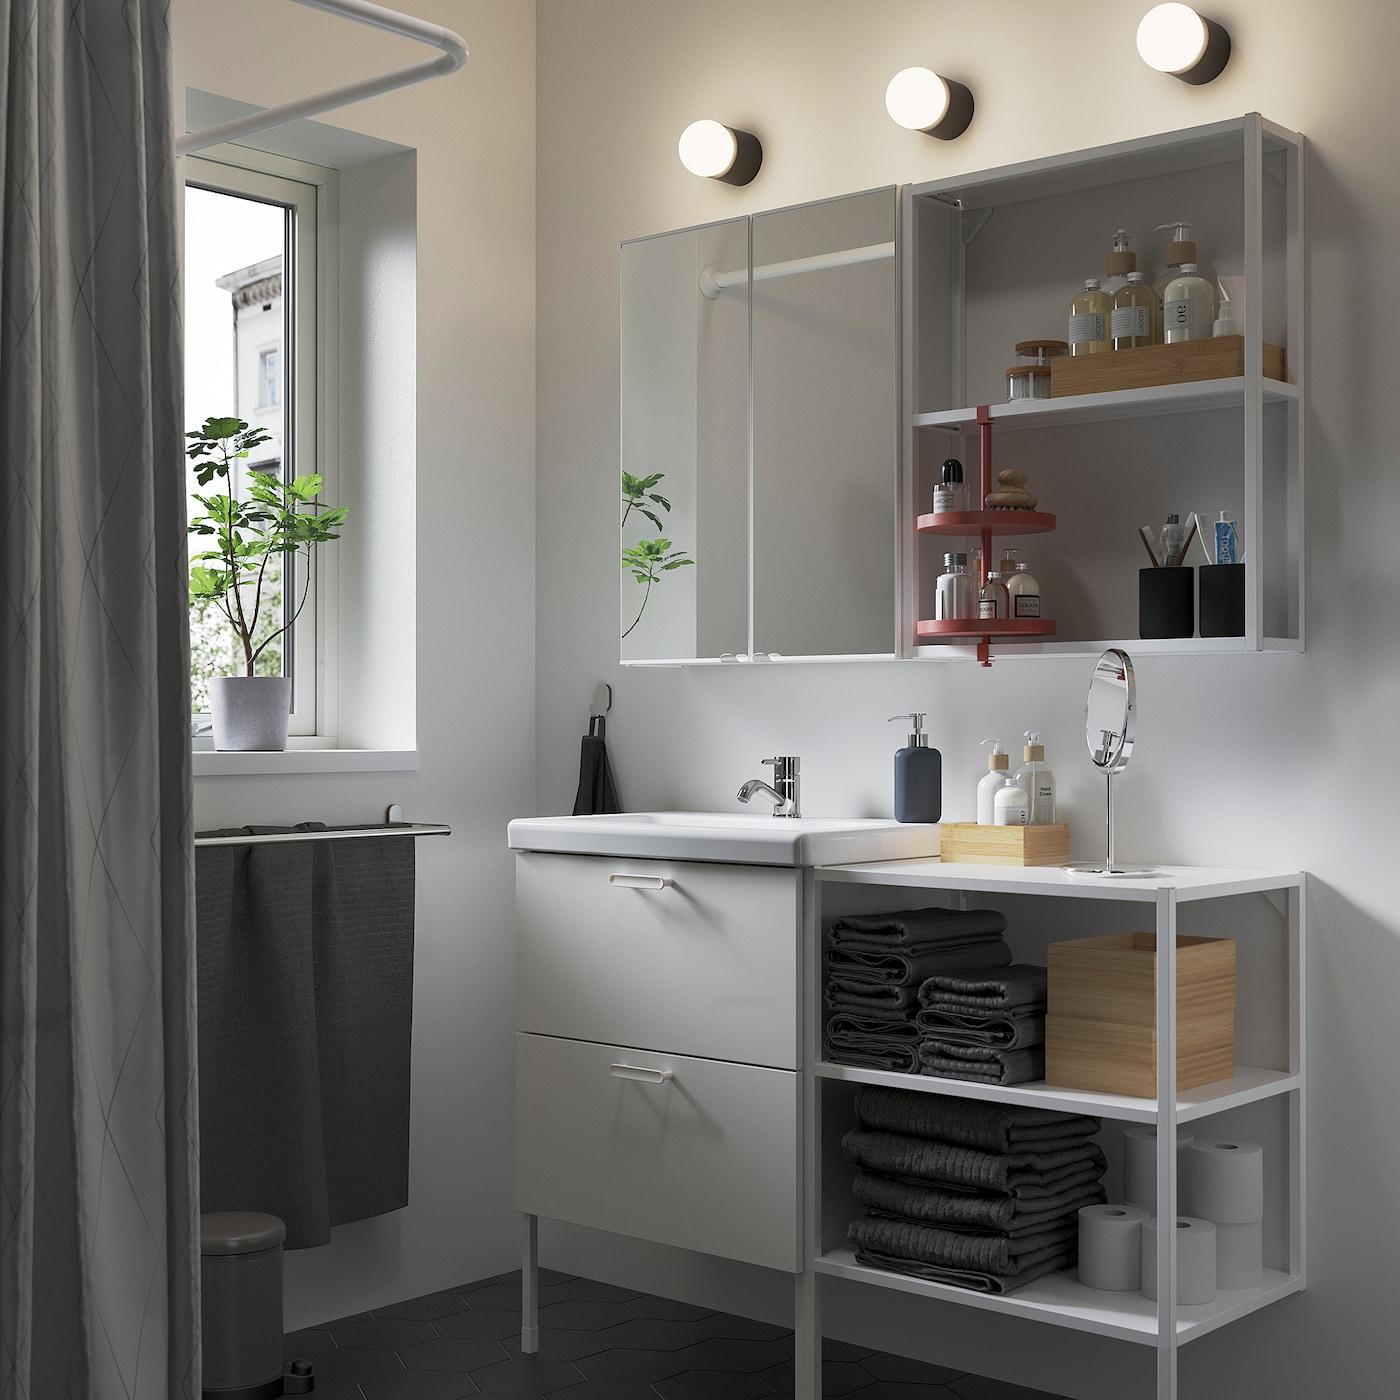 ENHET / TVÄLLEN Bathroom furniture, set of 15, white/Pilkån tap, 122x43x87 cm